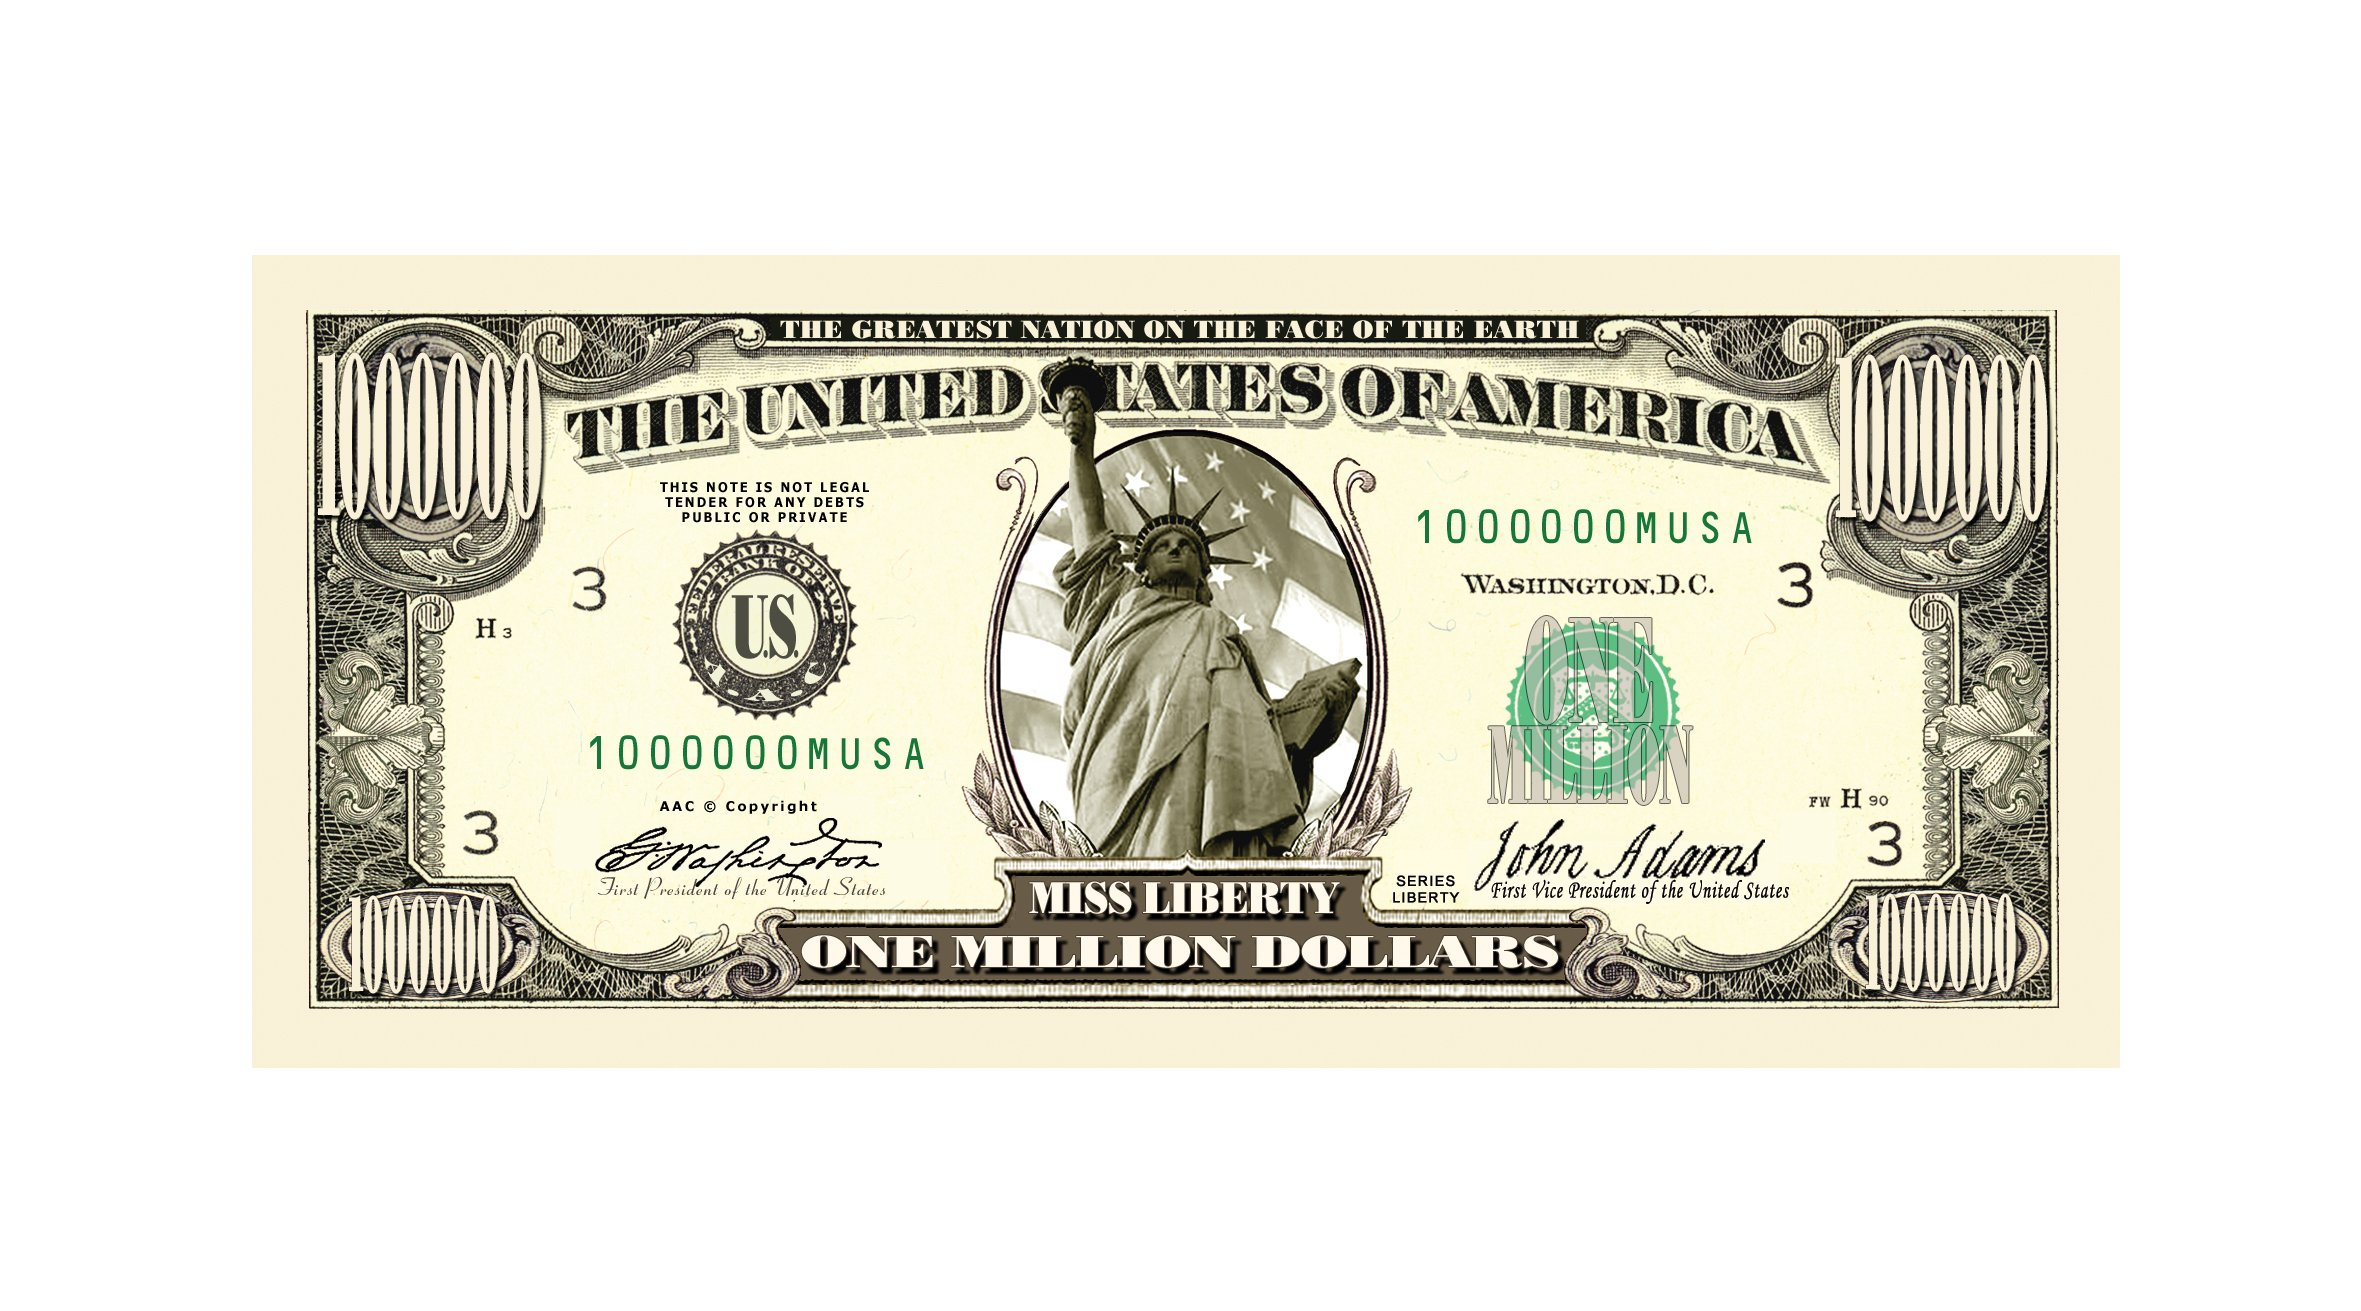 American Art Classics Traditional Million Dollar Bill - Wholesale Pack of 1000 Bills by American Art Classics (Image #2)